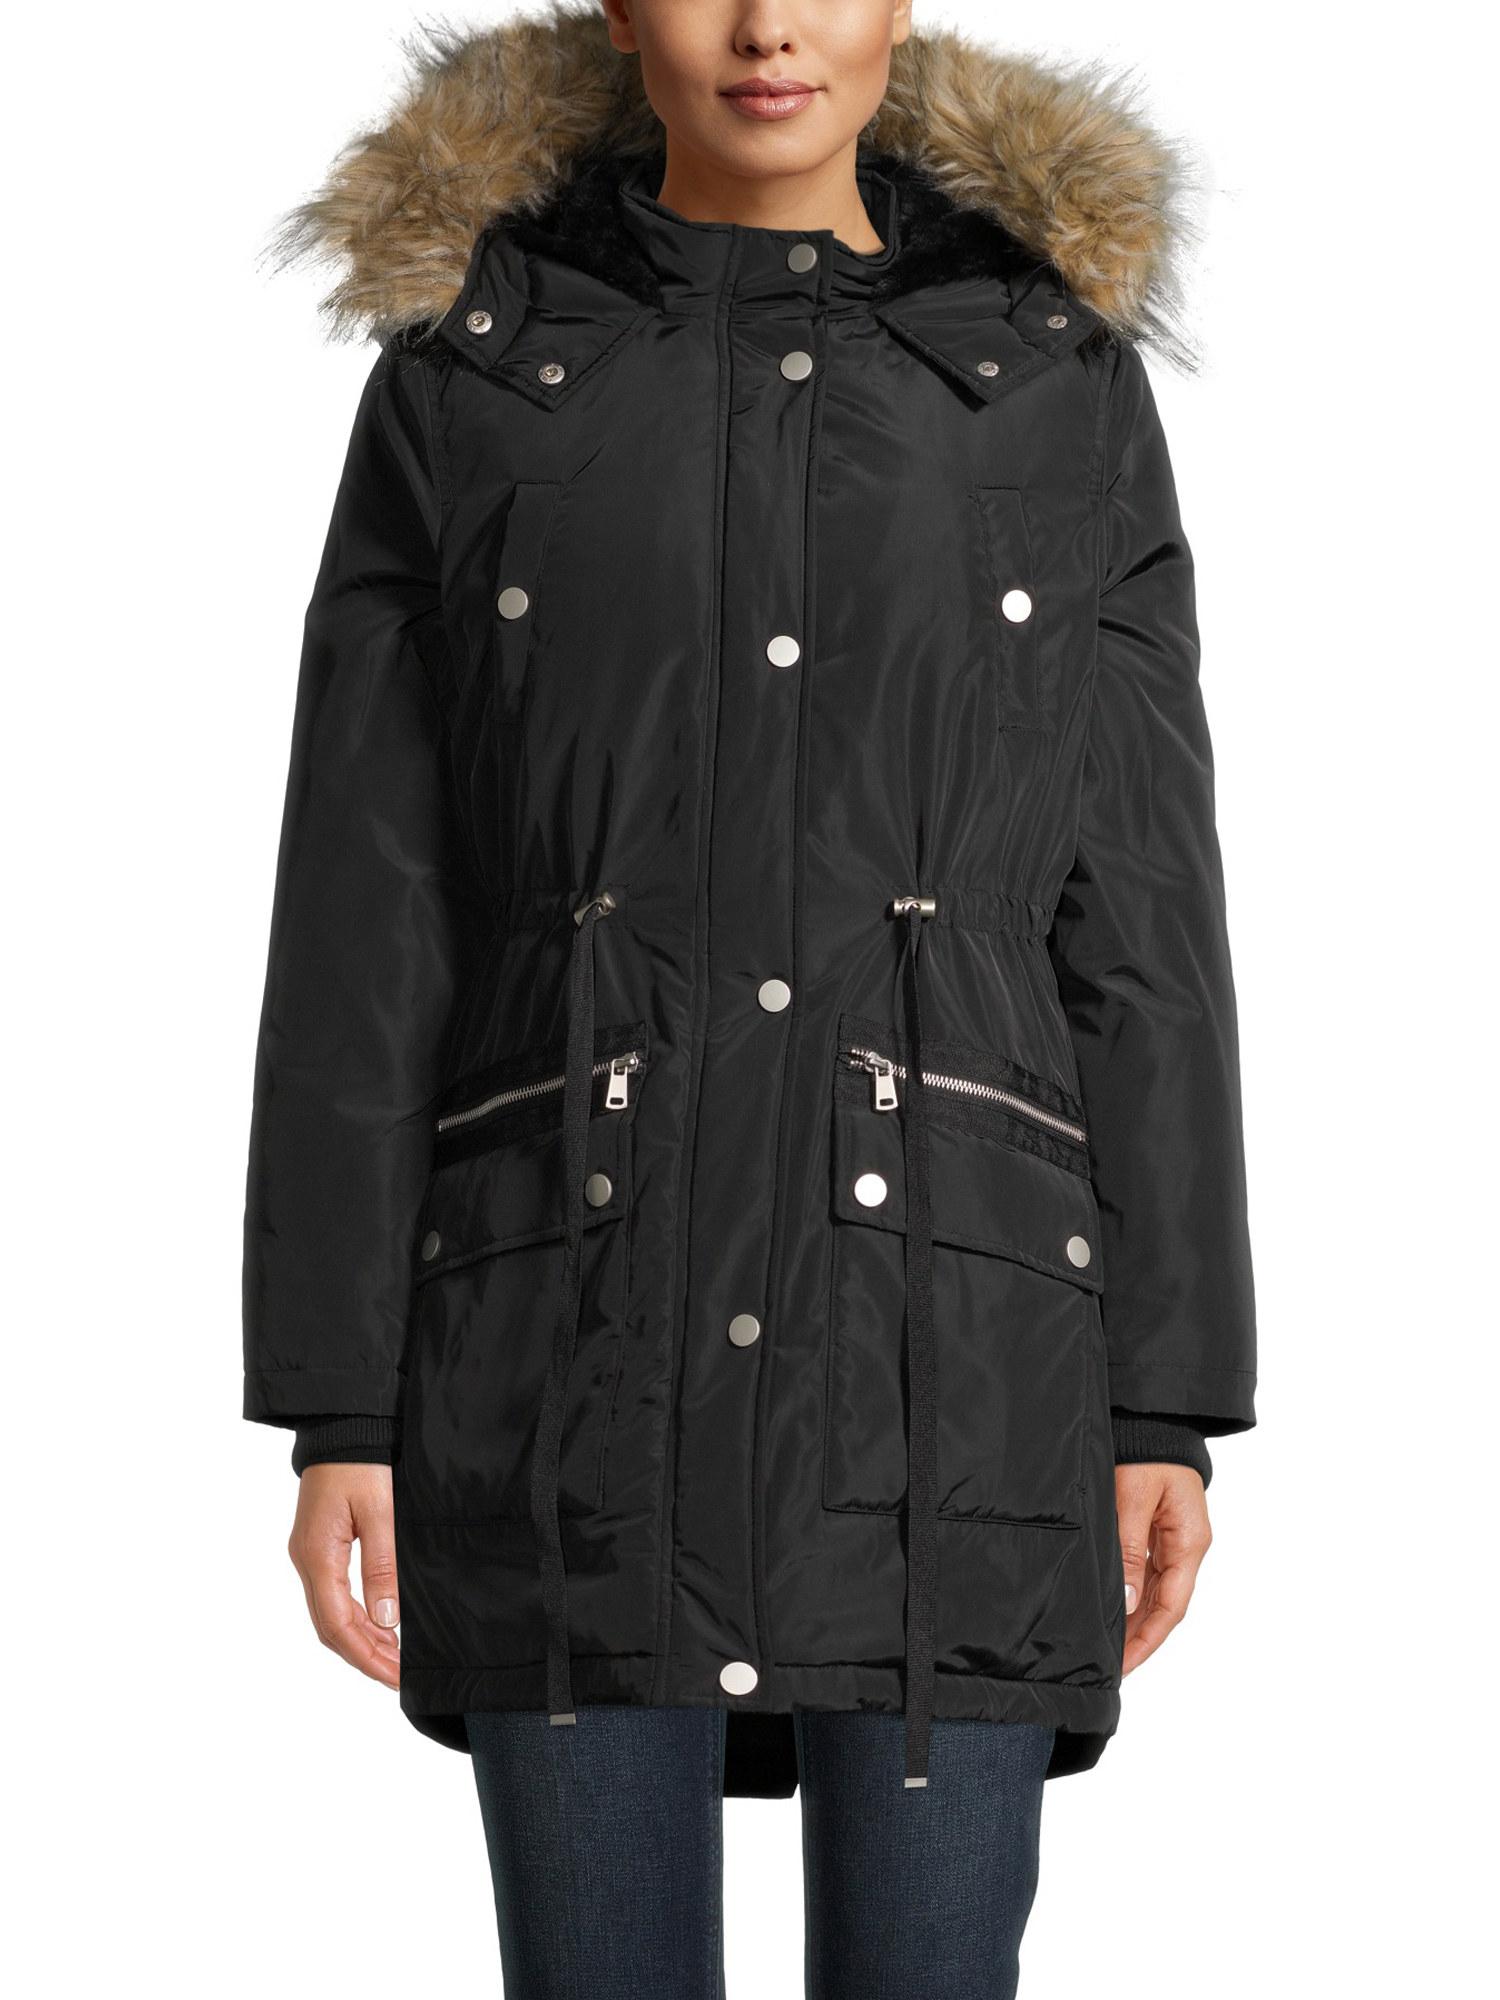 Model wearing the rich black anorak coat